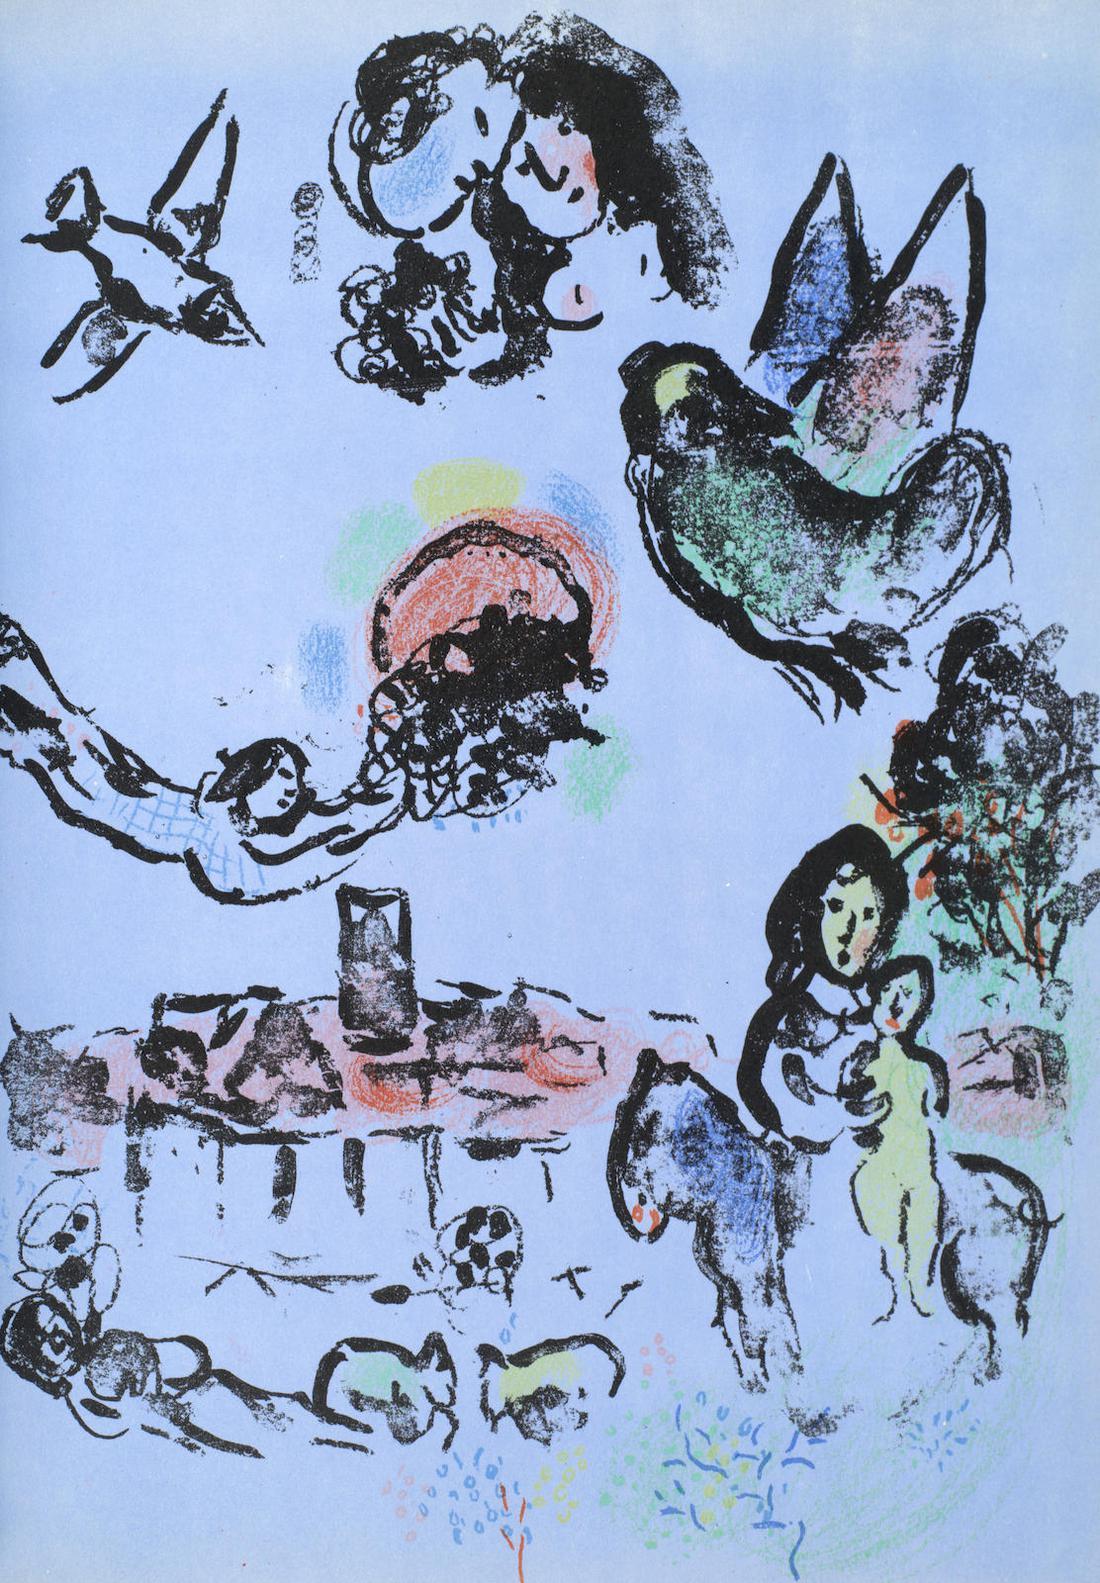 Marc Chagall-Lithograph I-IV (Cramer 43, 53, 77, 94)-1974